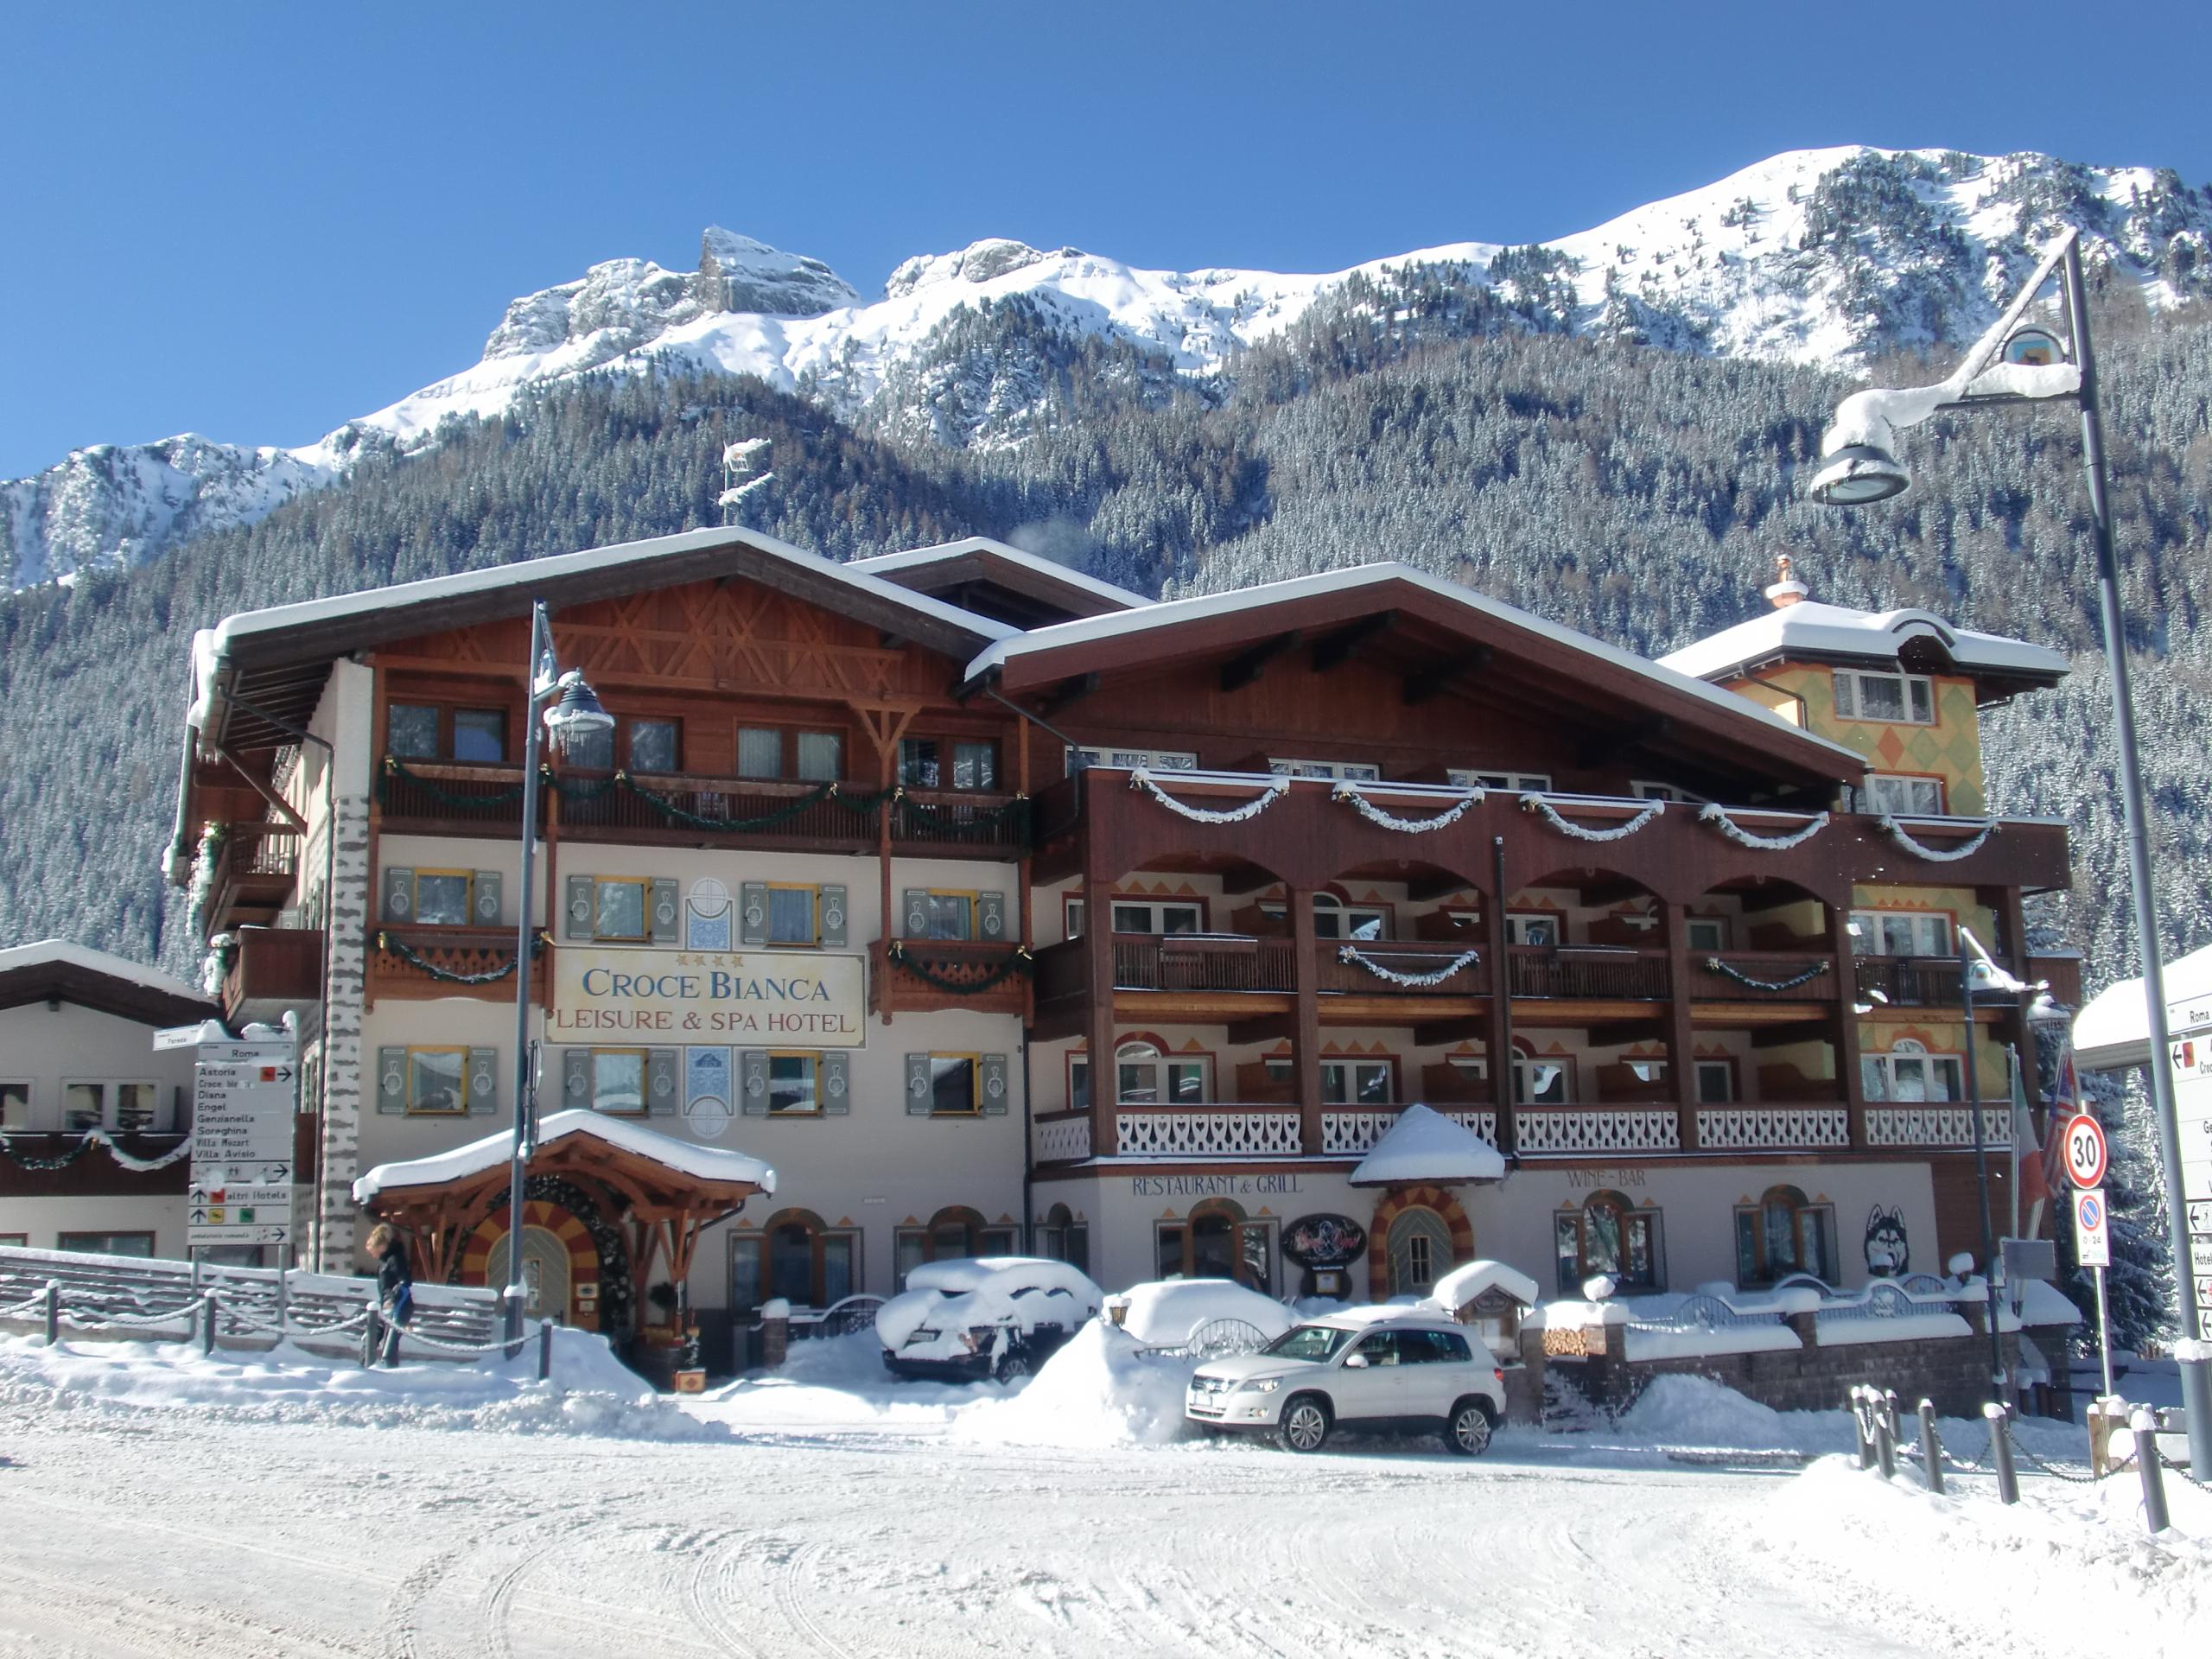 Croce Bianca Leisure & Spa Hotel